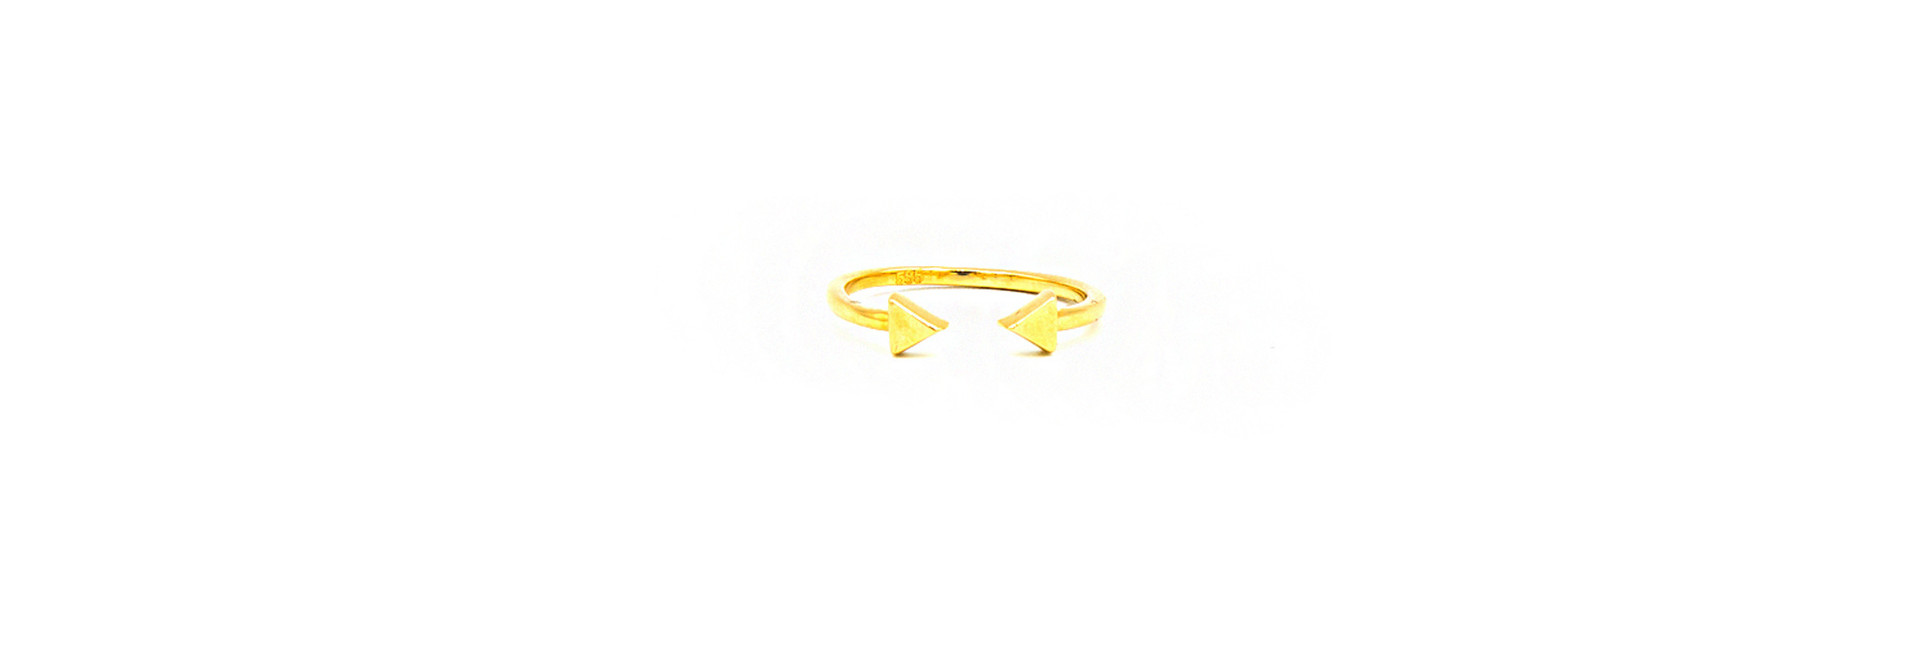 Ring arrow